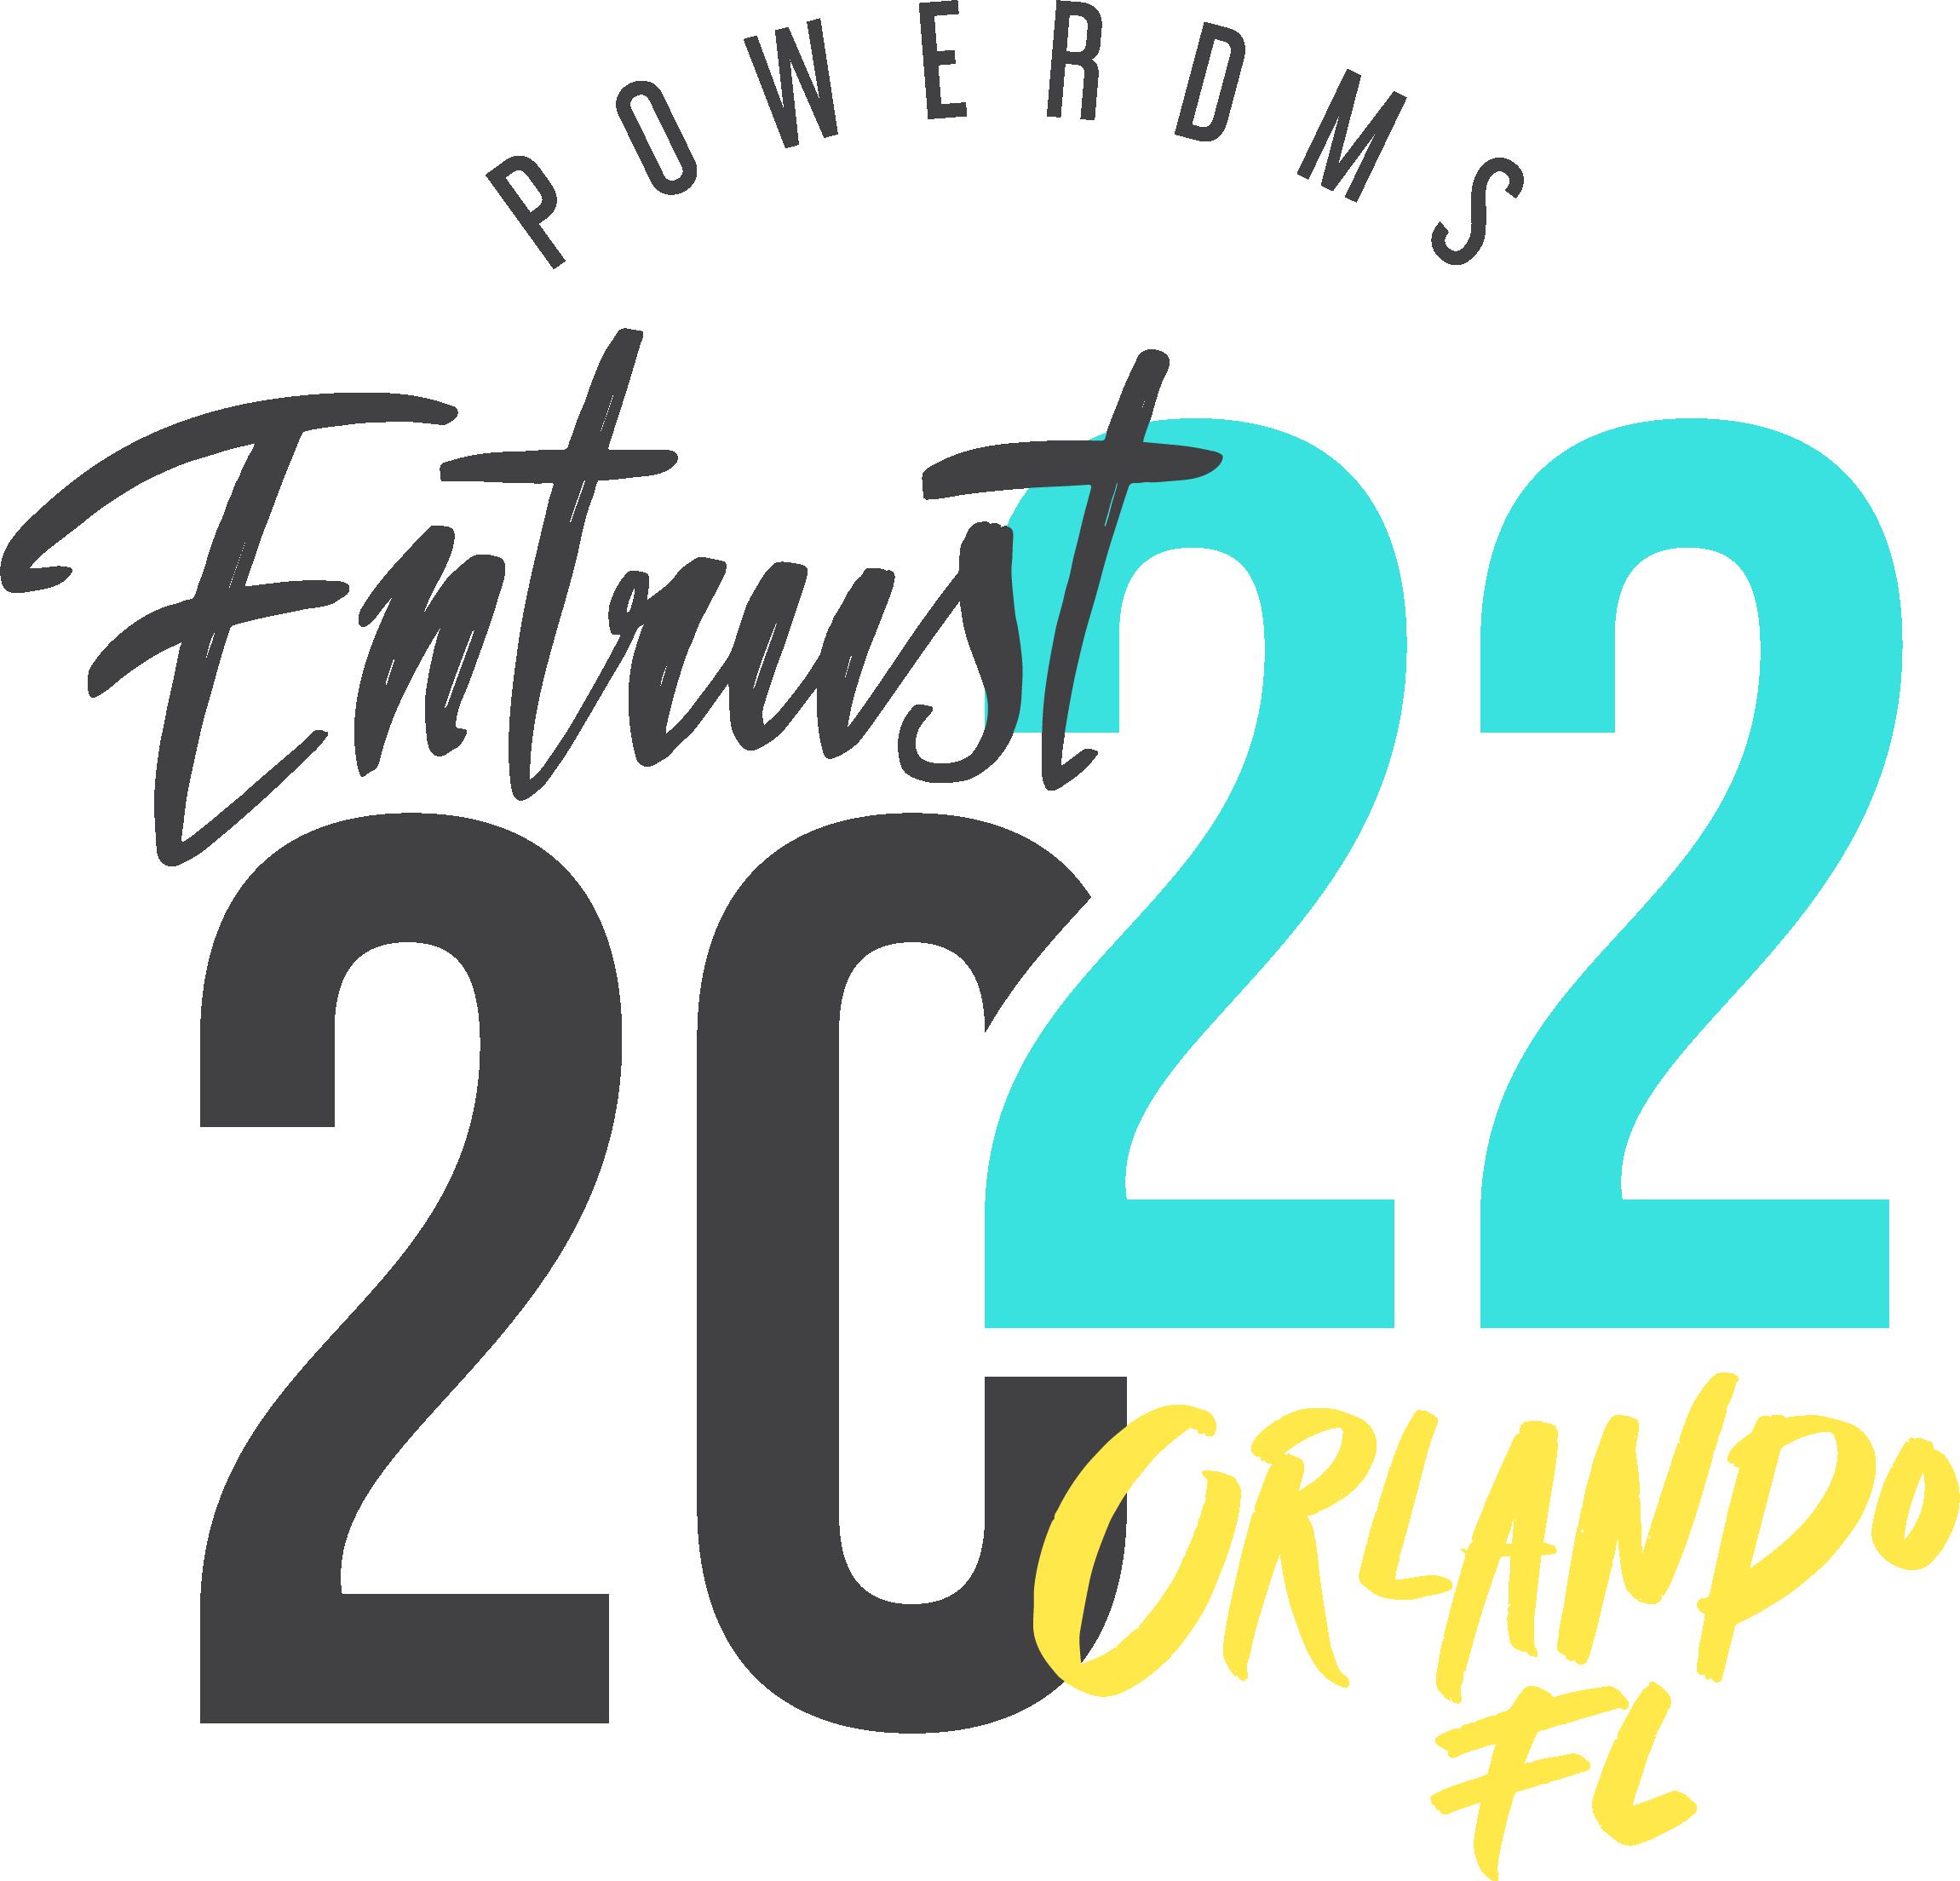 entrust-logo-secondary-2022